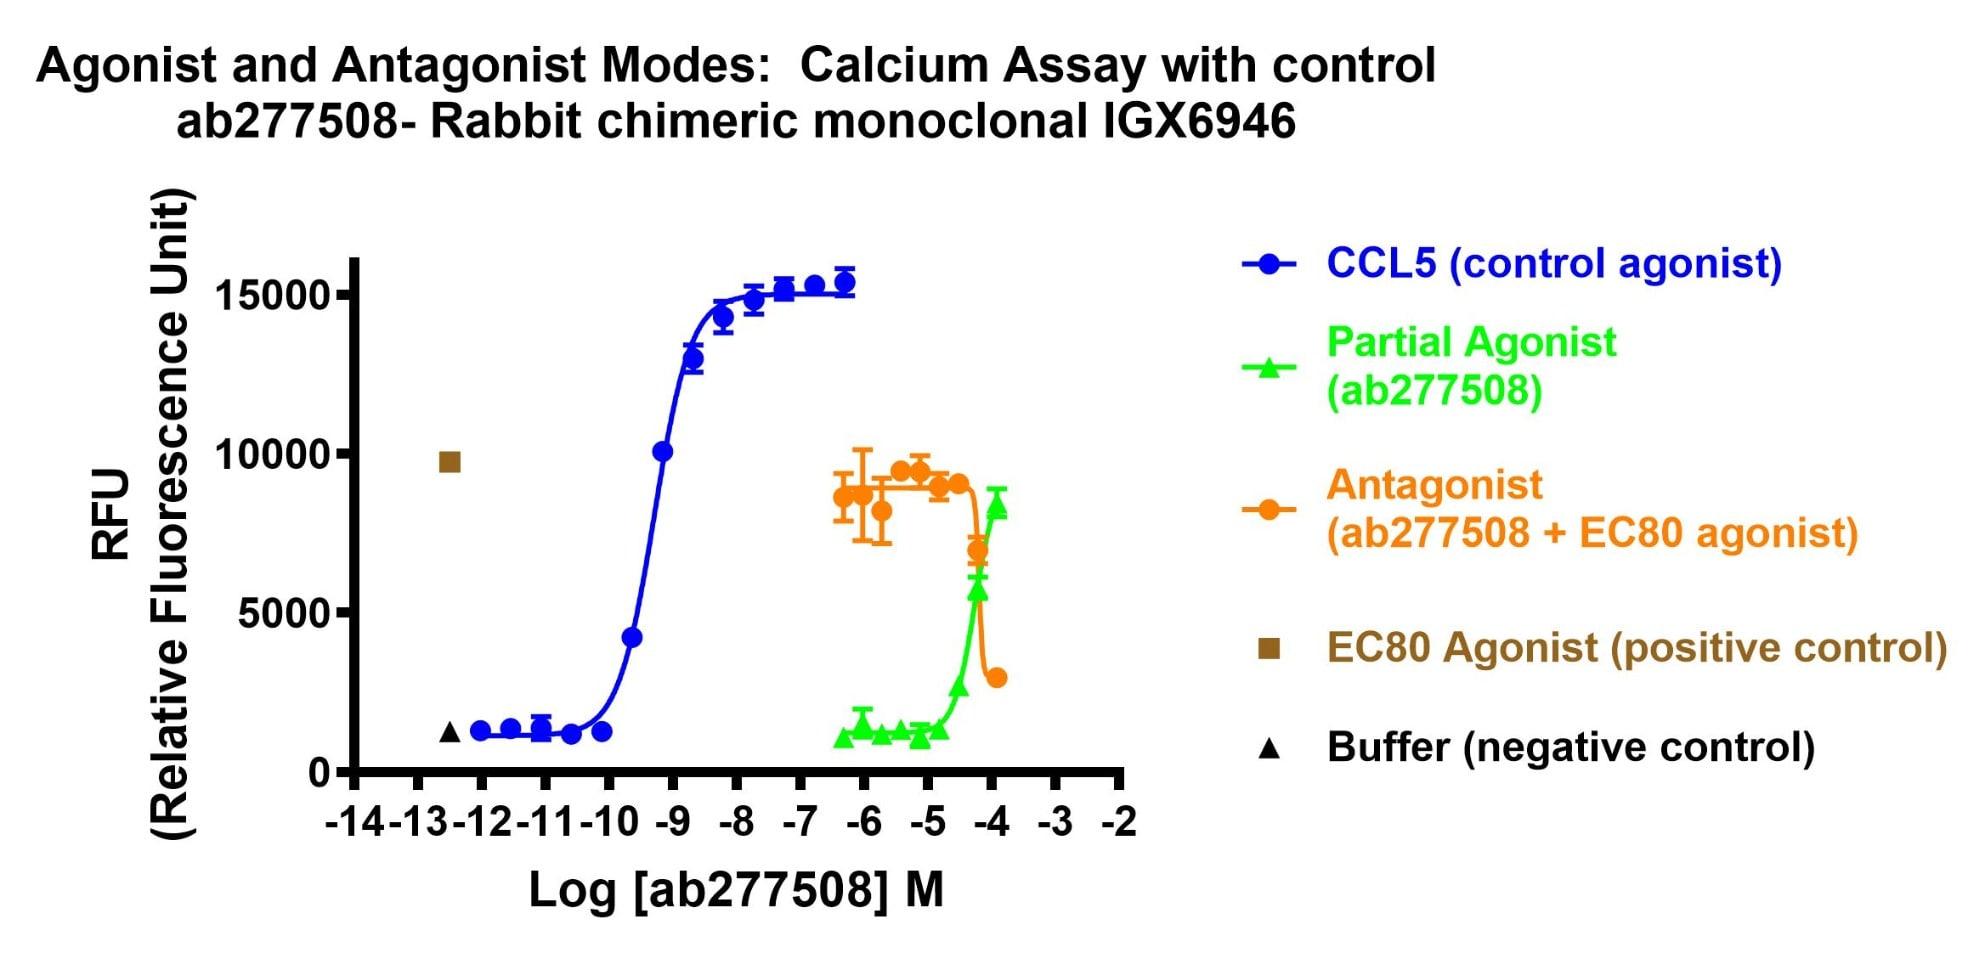 Functional Studies - Anti-CCR5 antibody [IGX6946] (ab277508)